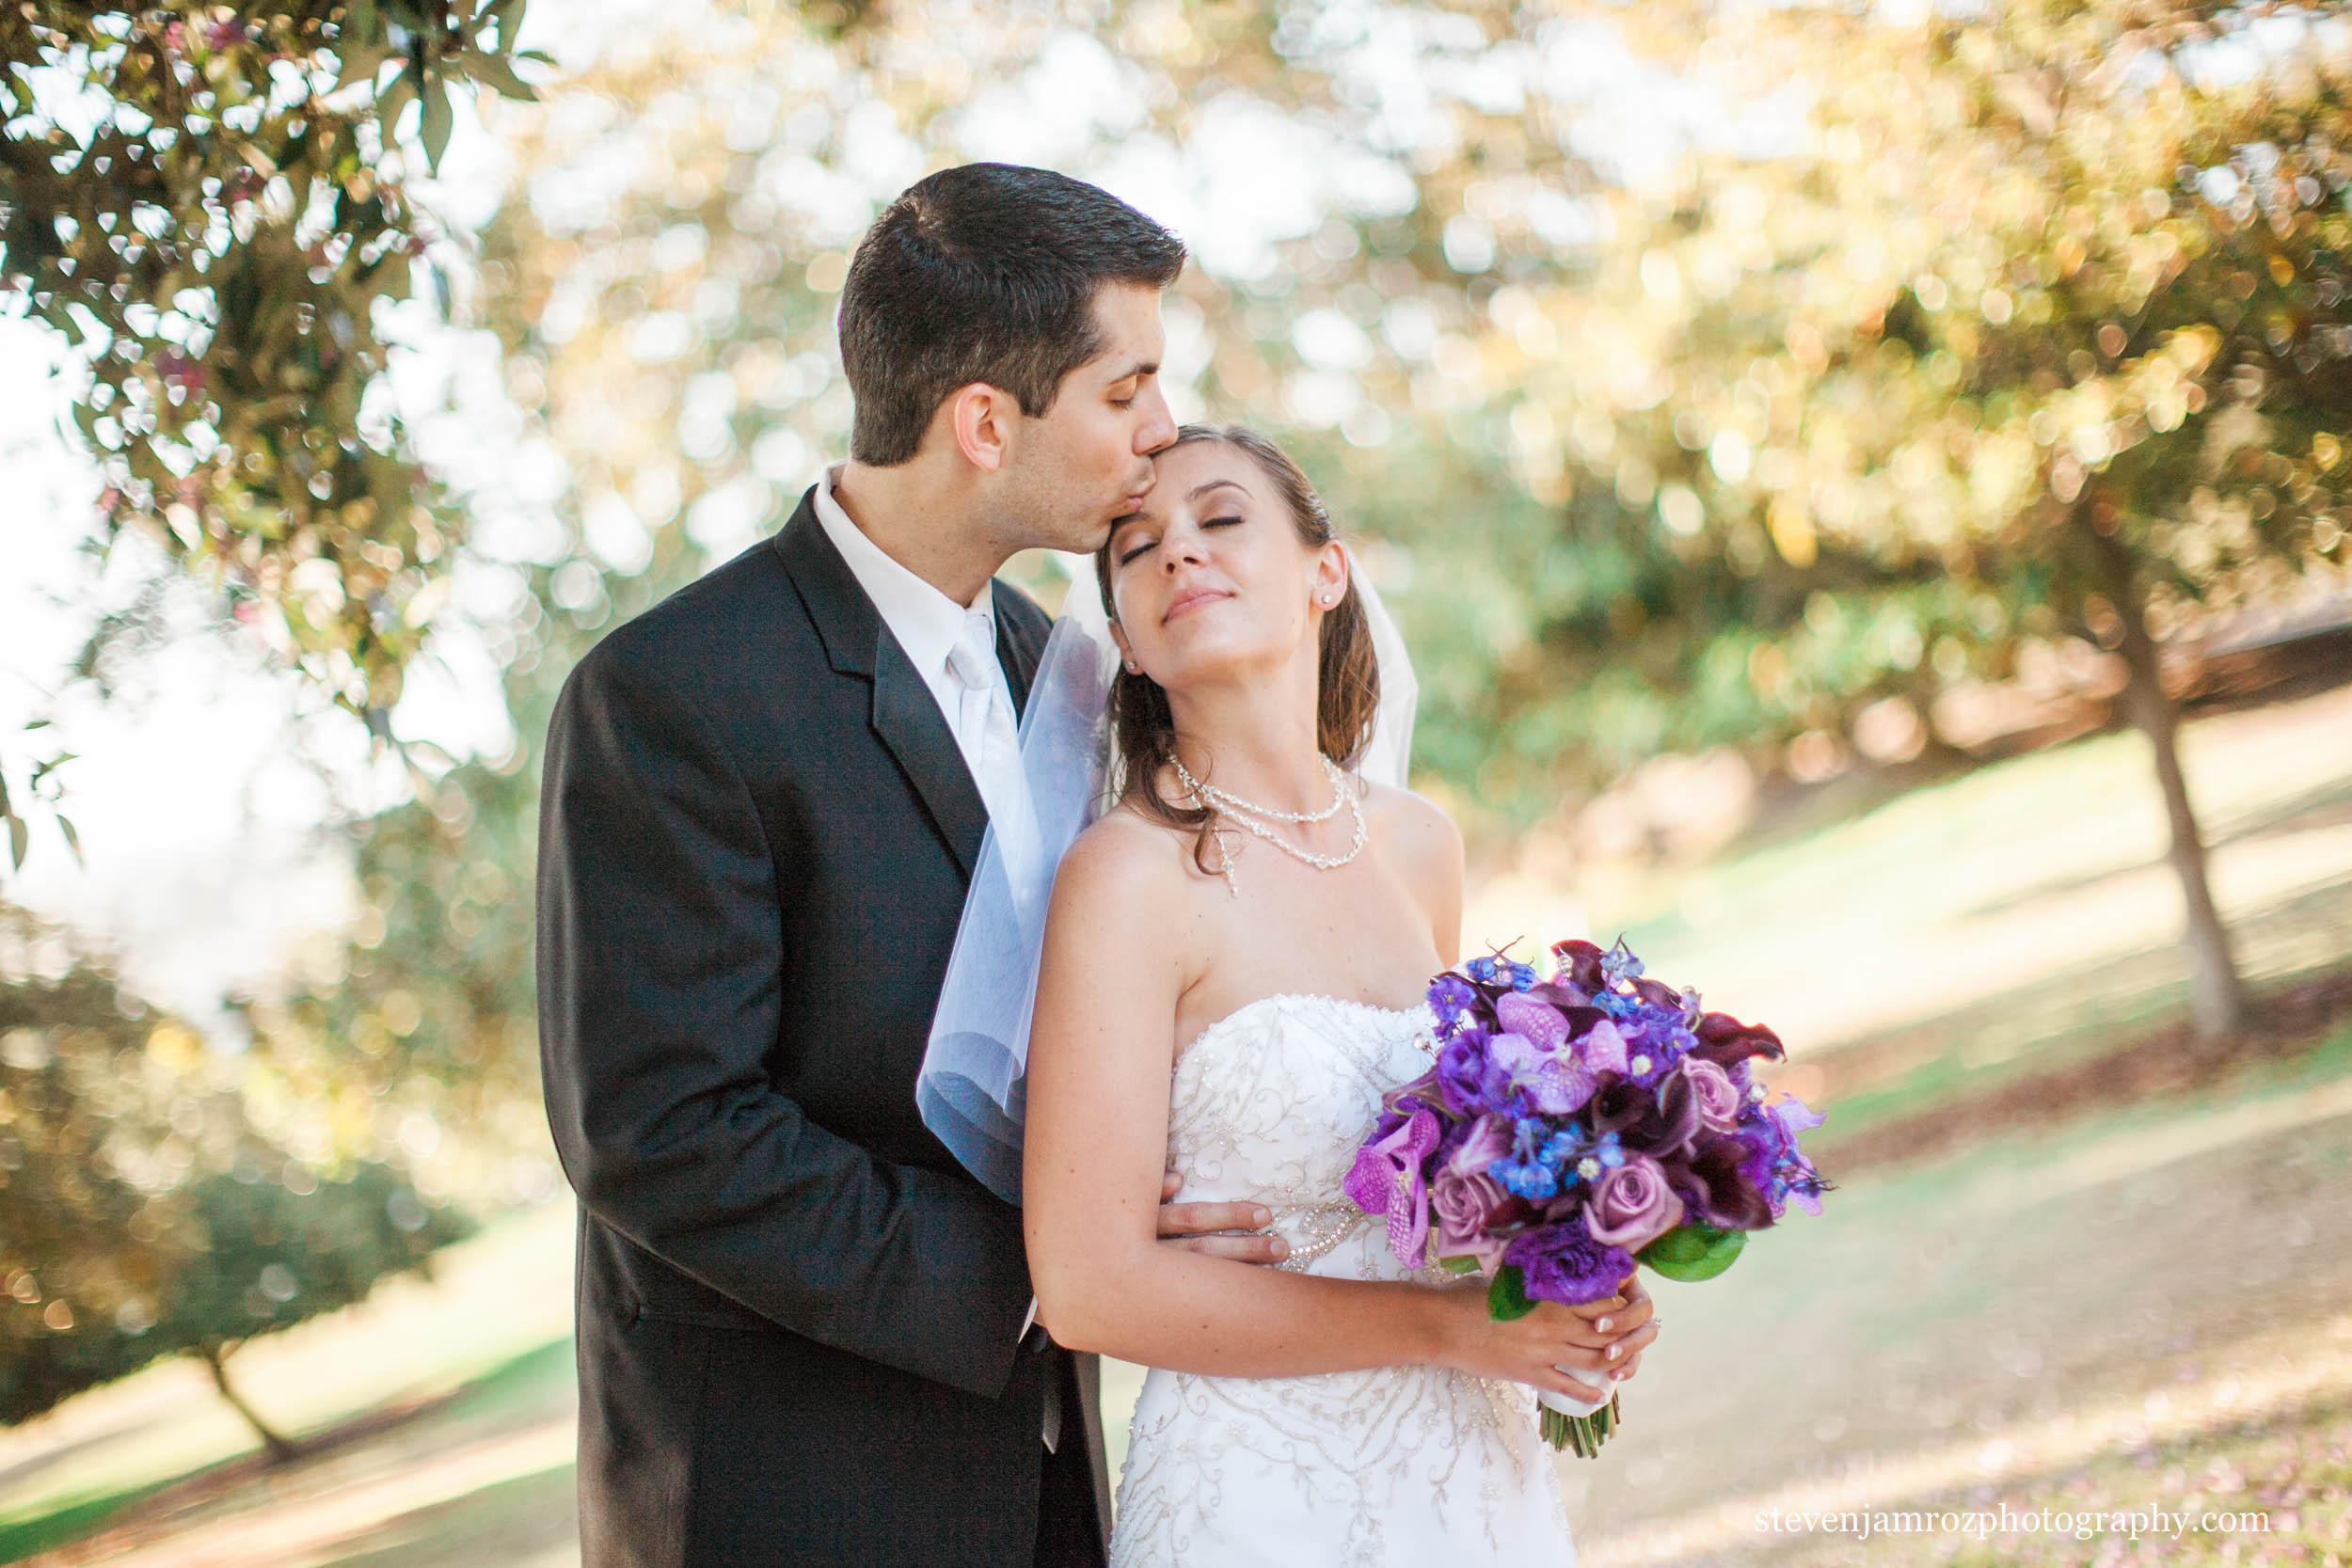 forhead-kiss-bride-raleigh-nc-steven-jamroz-photography-0191.jpg